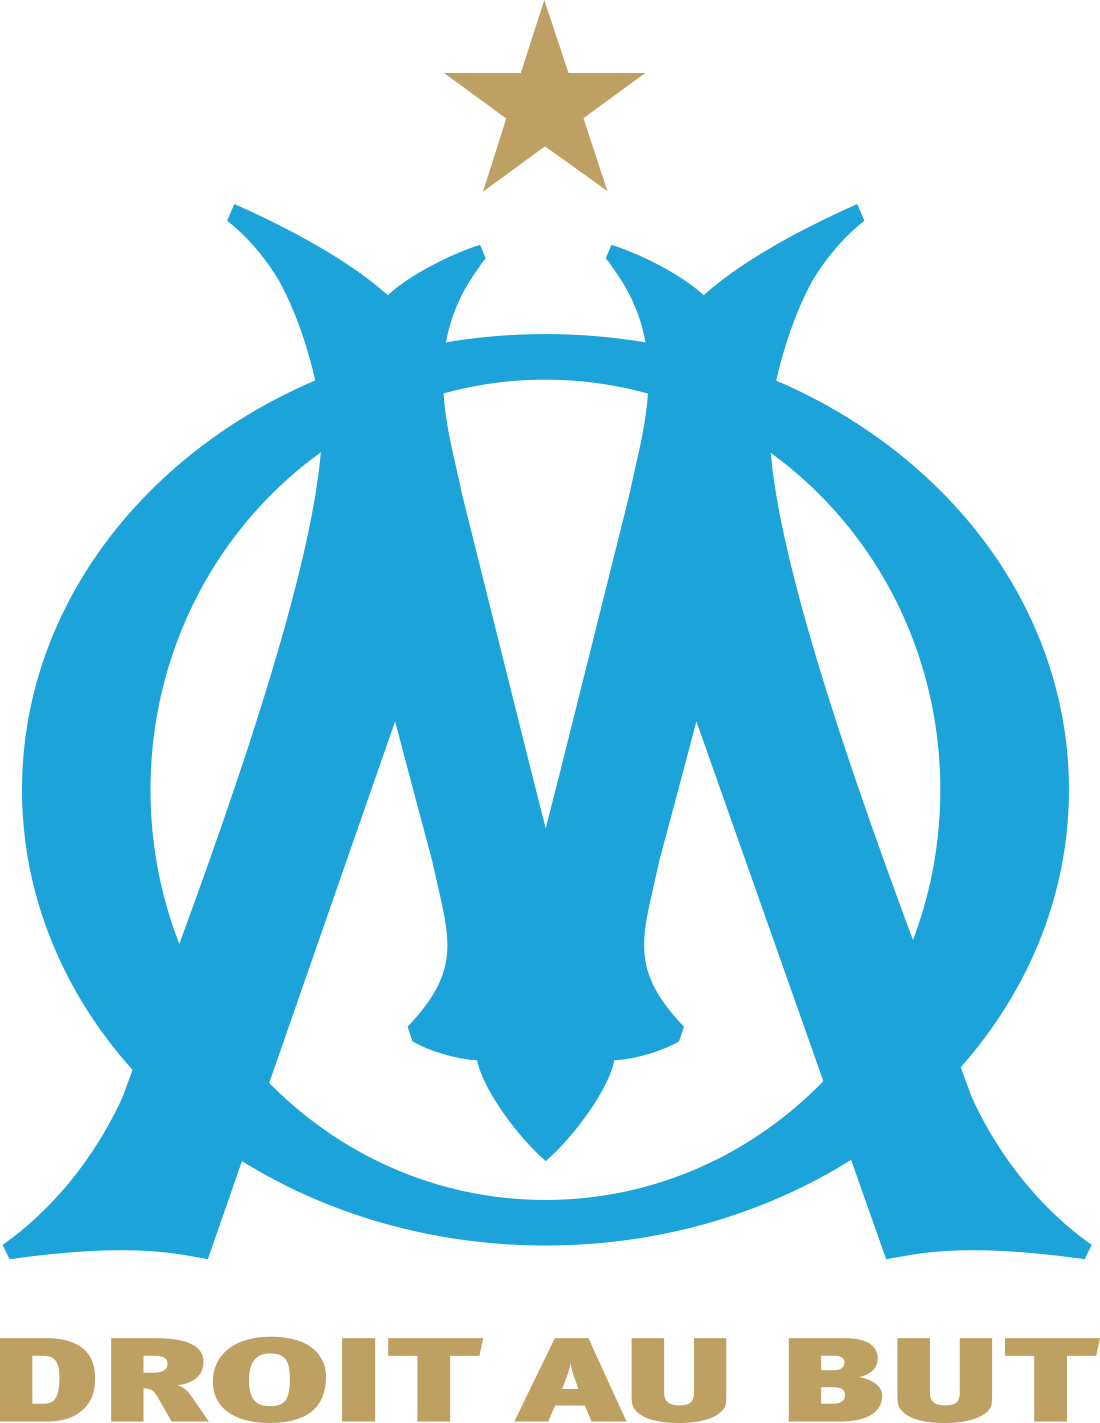 olympique de marseille 4 - Olympique de Marseille Logo